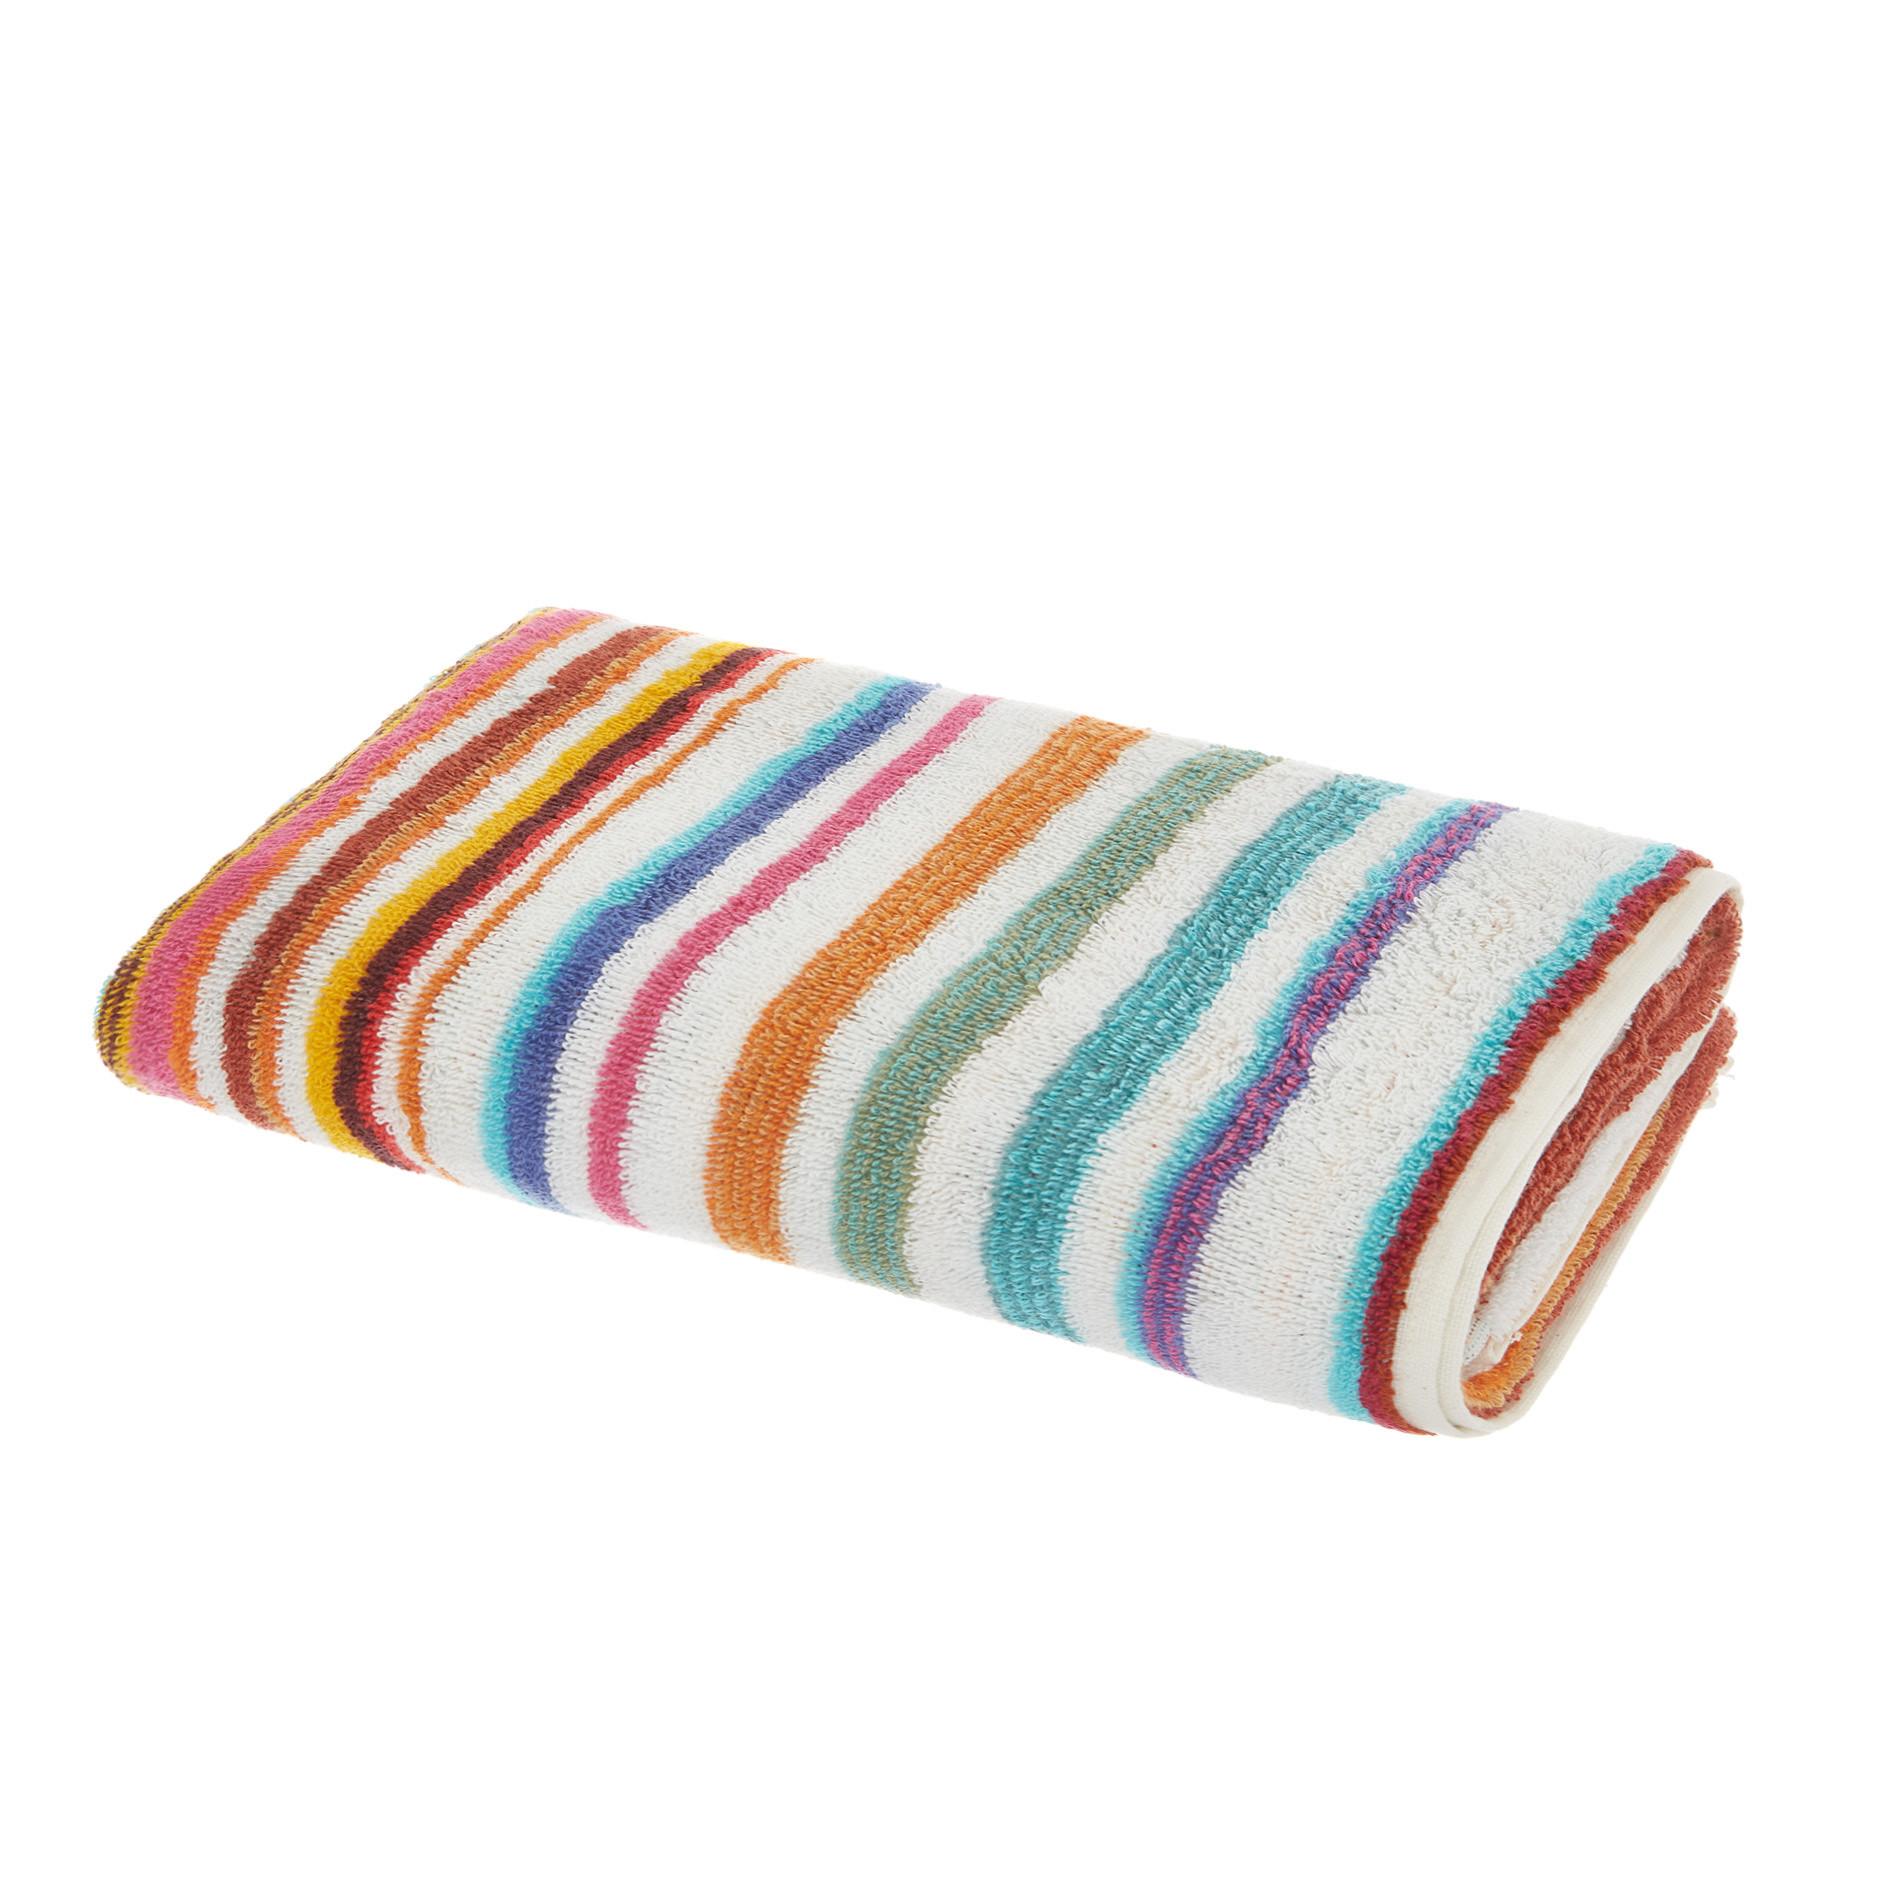 Asciugamano cotone tinto filo a righe, Arancione, large image number 0